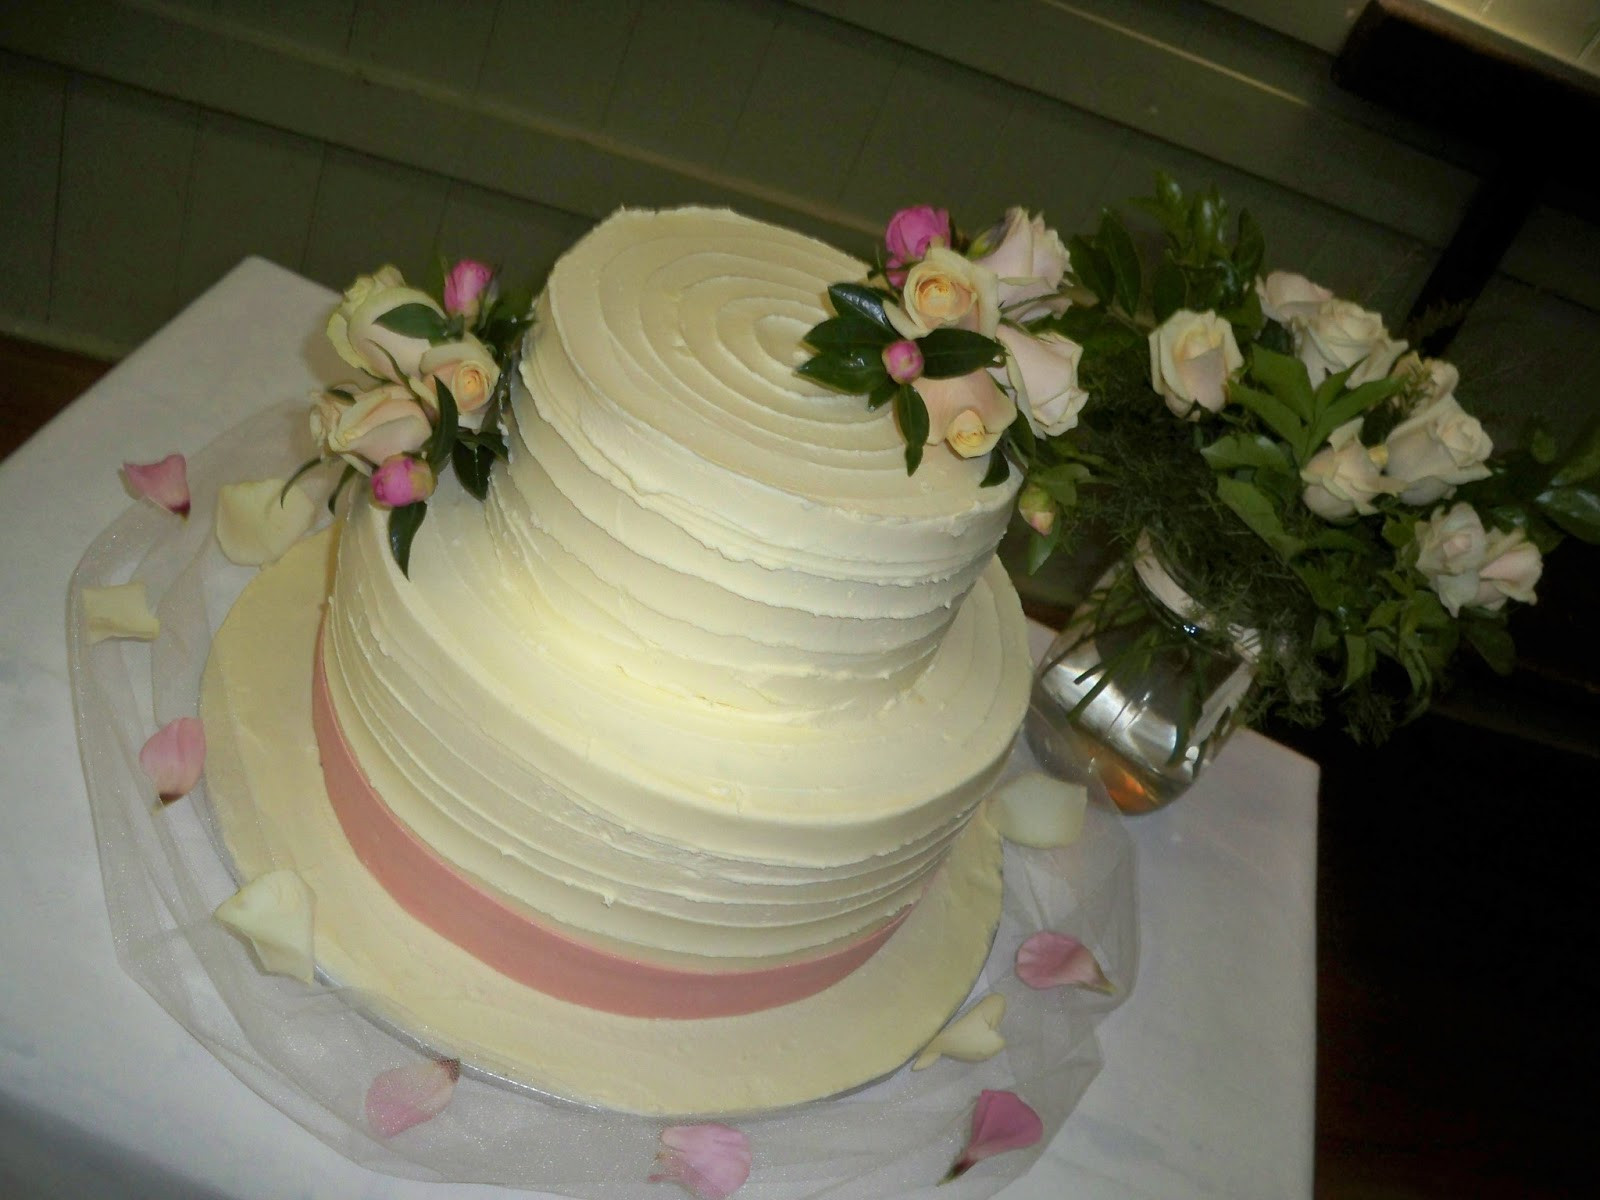 Chocolate Ganache Wedding Cakes  simple white chocolate ganache wedding cake with pink